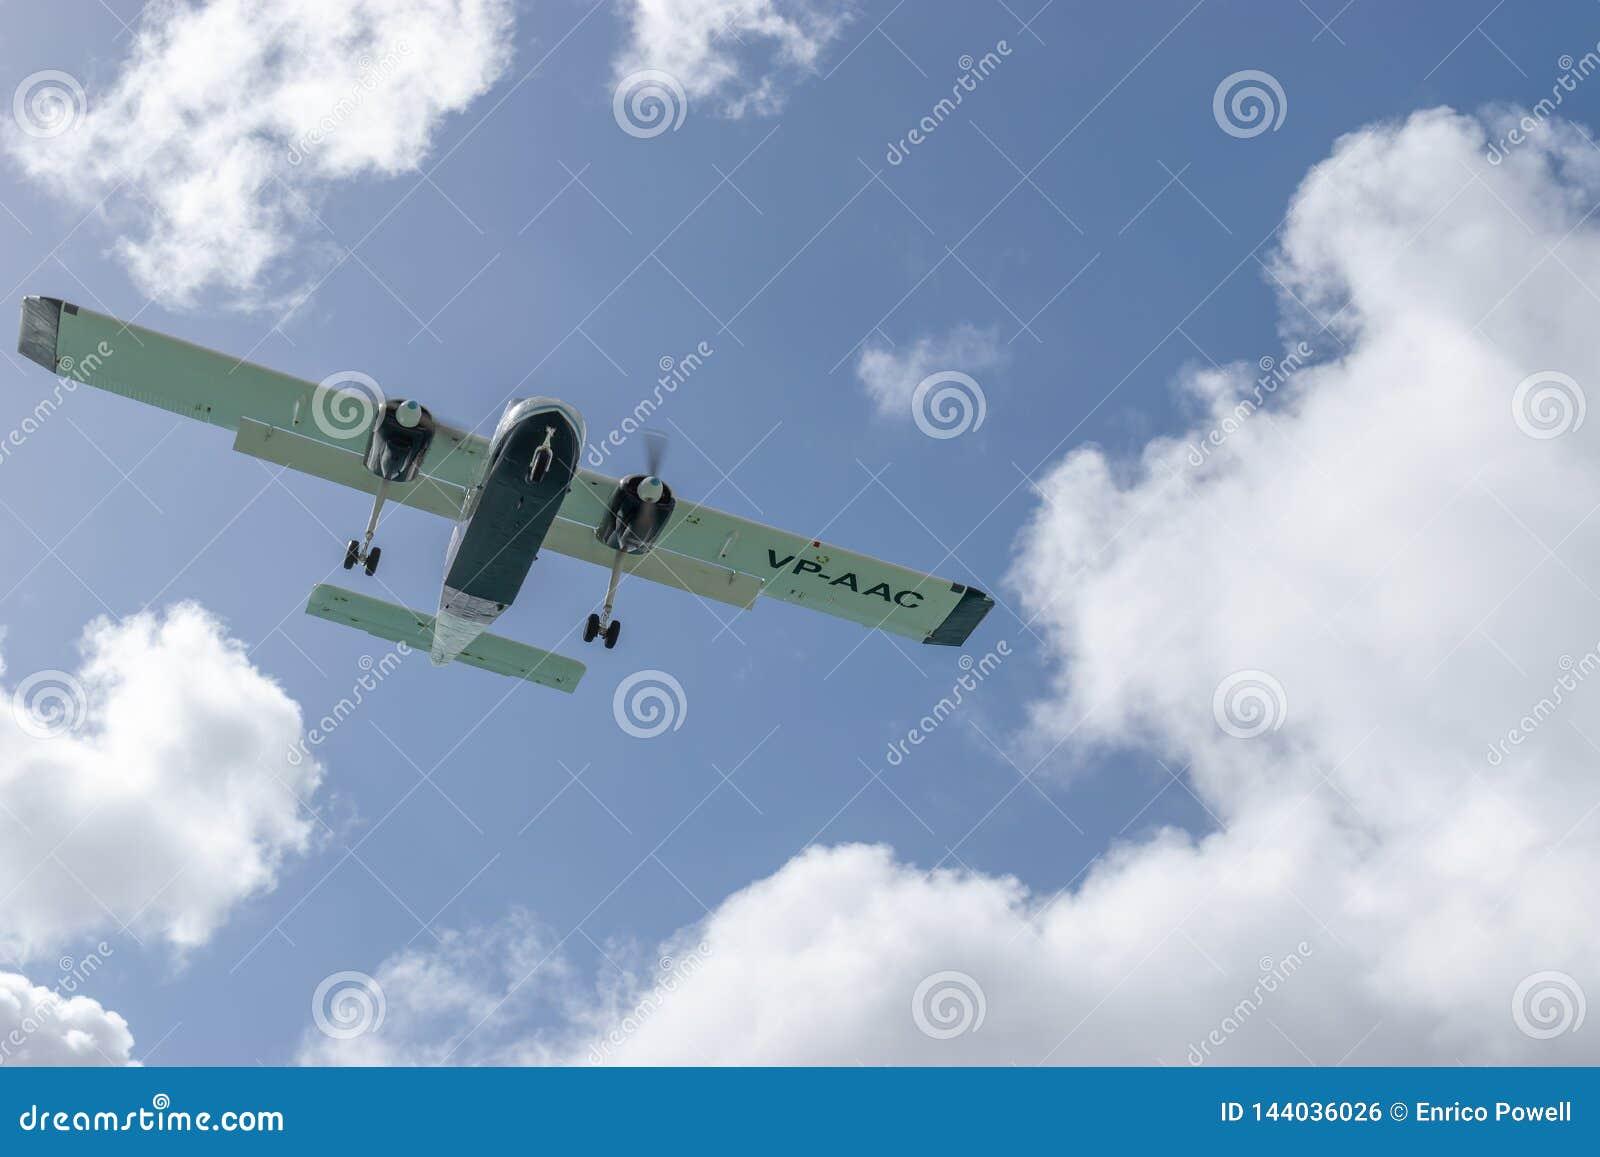 Anguilla Luchtdienstenaas de britten-Normandische miljard-2a vliegtuigen vp-AAC van het Eilandbewoner lichte nut